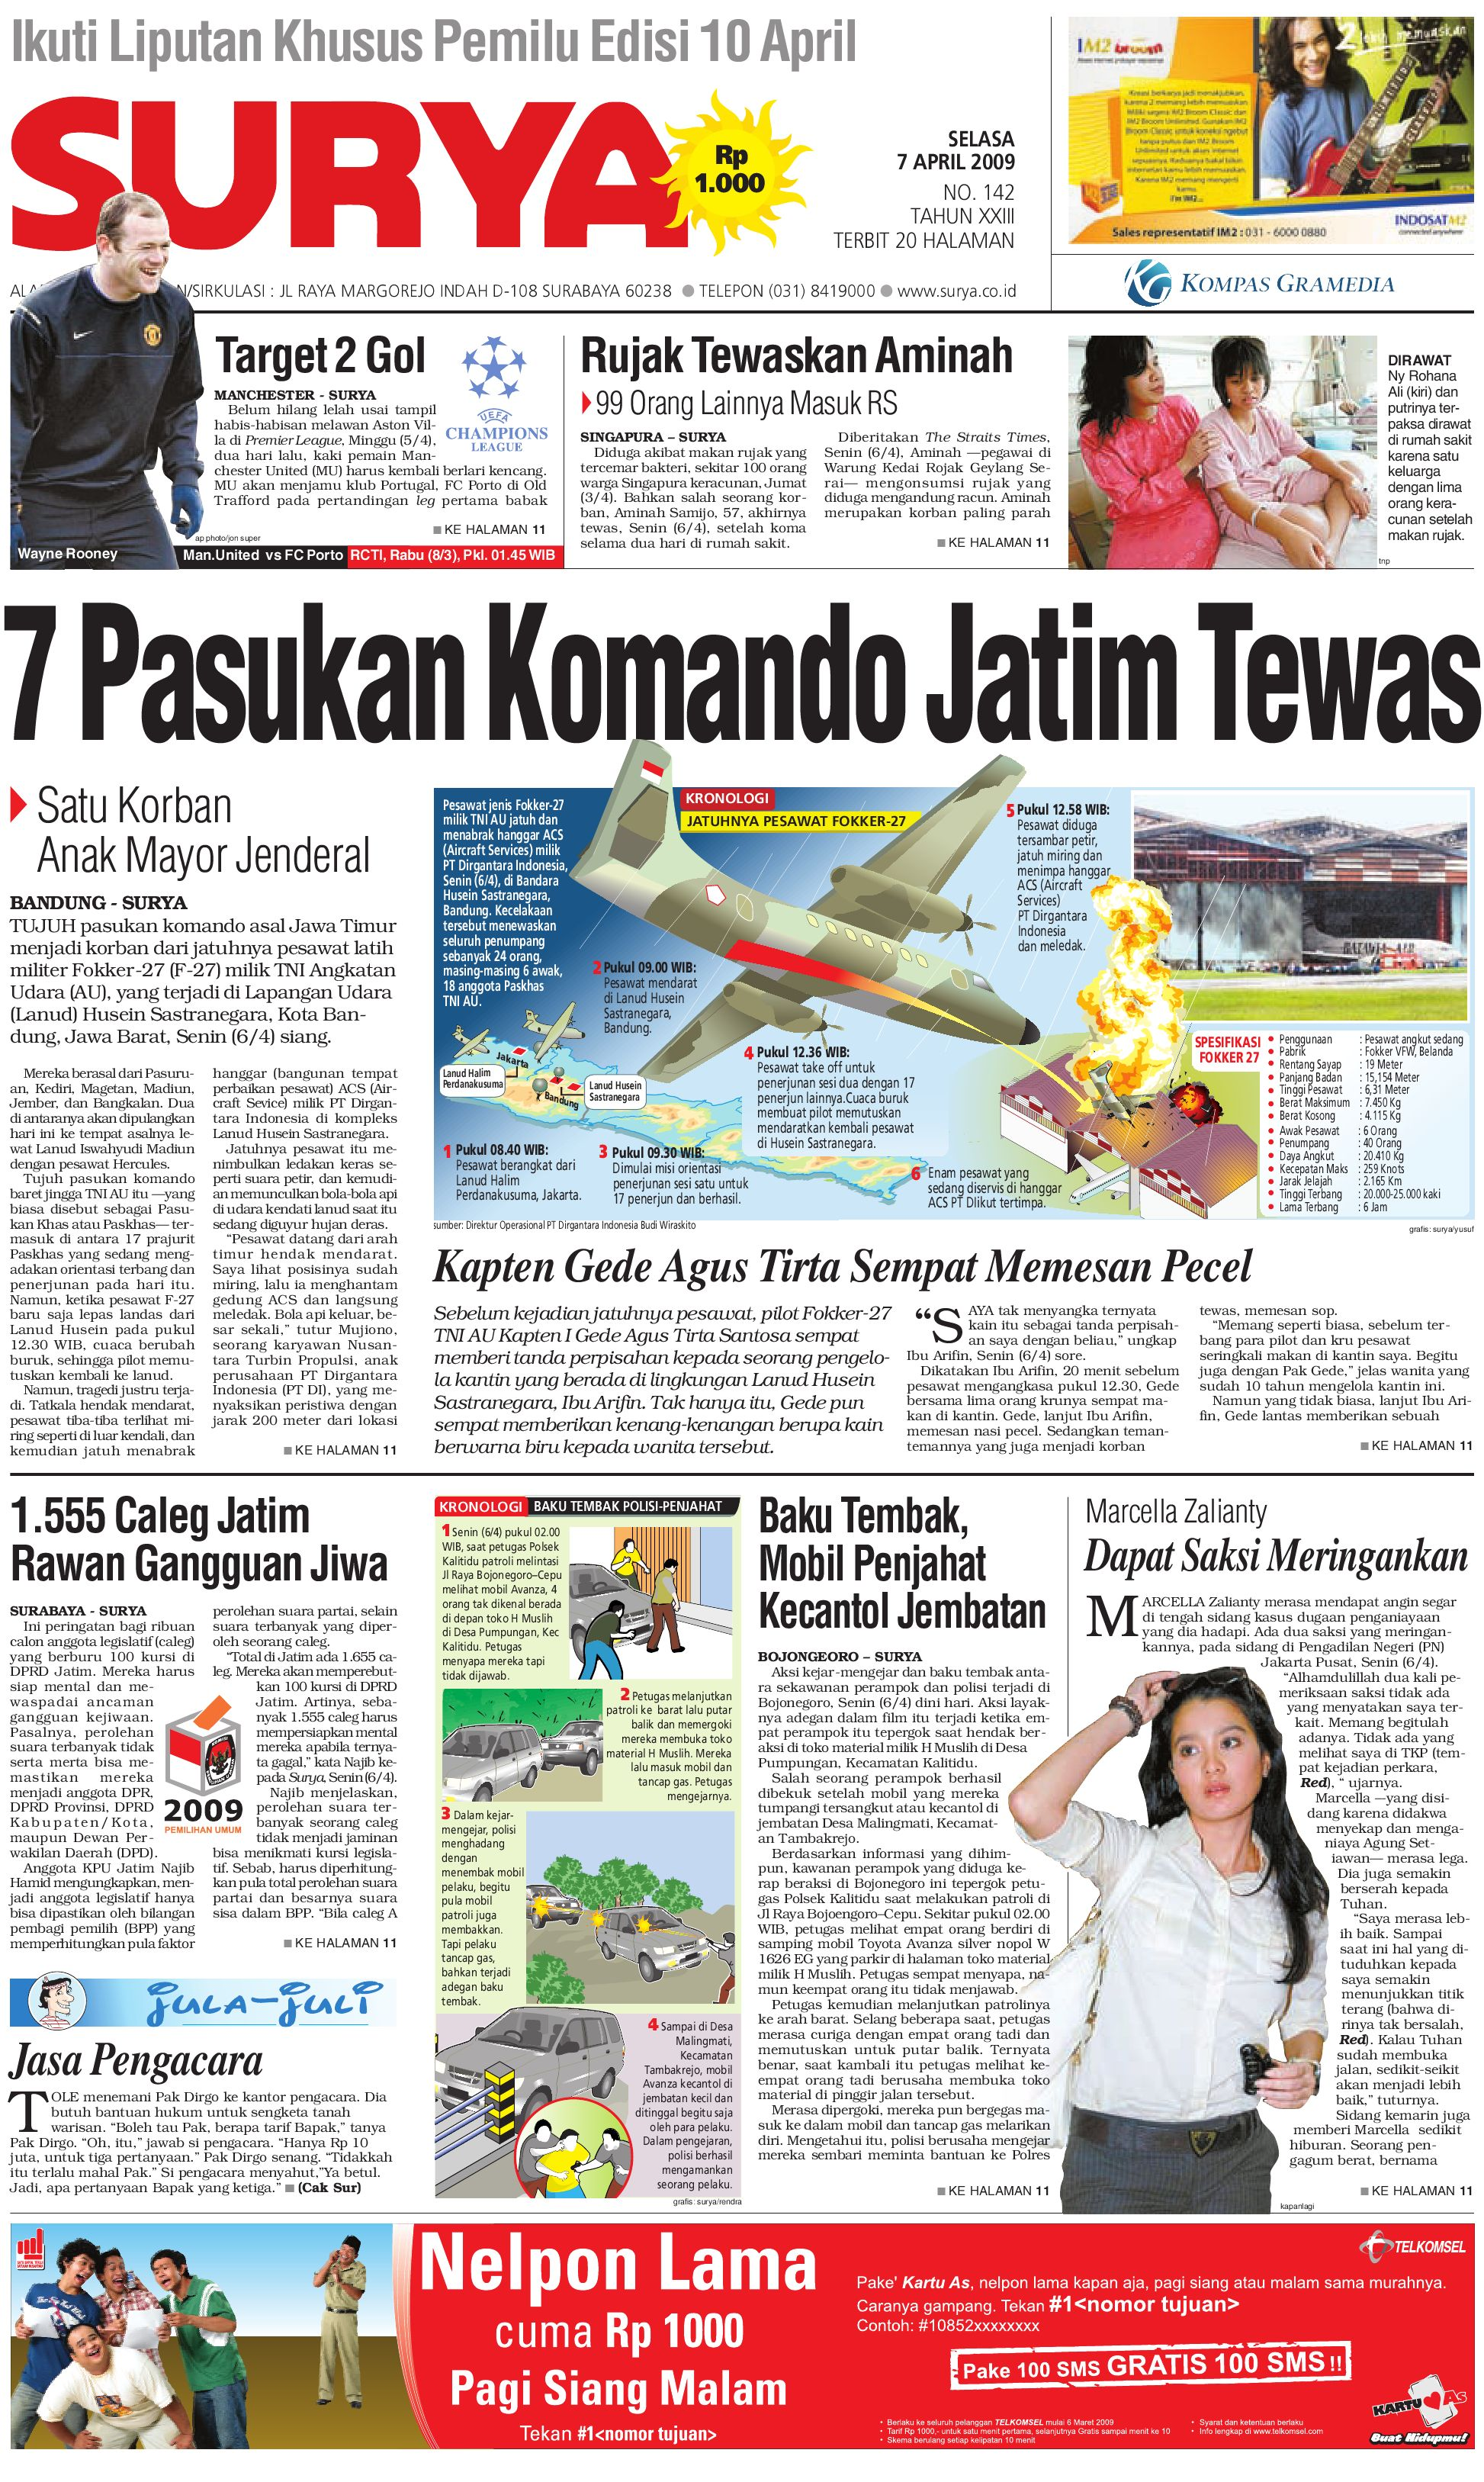 Surya Edisi Cetak 07 April 2009 by Harian SURYA - issuu 0ad54ca0b5